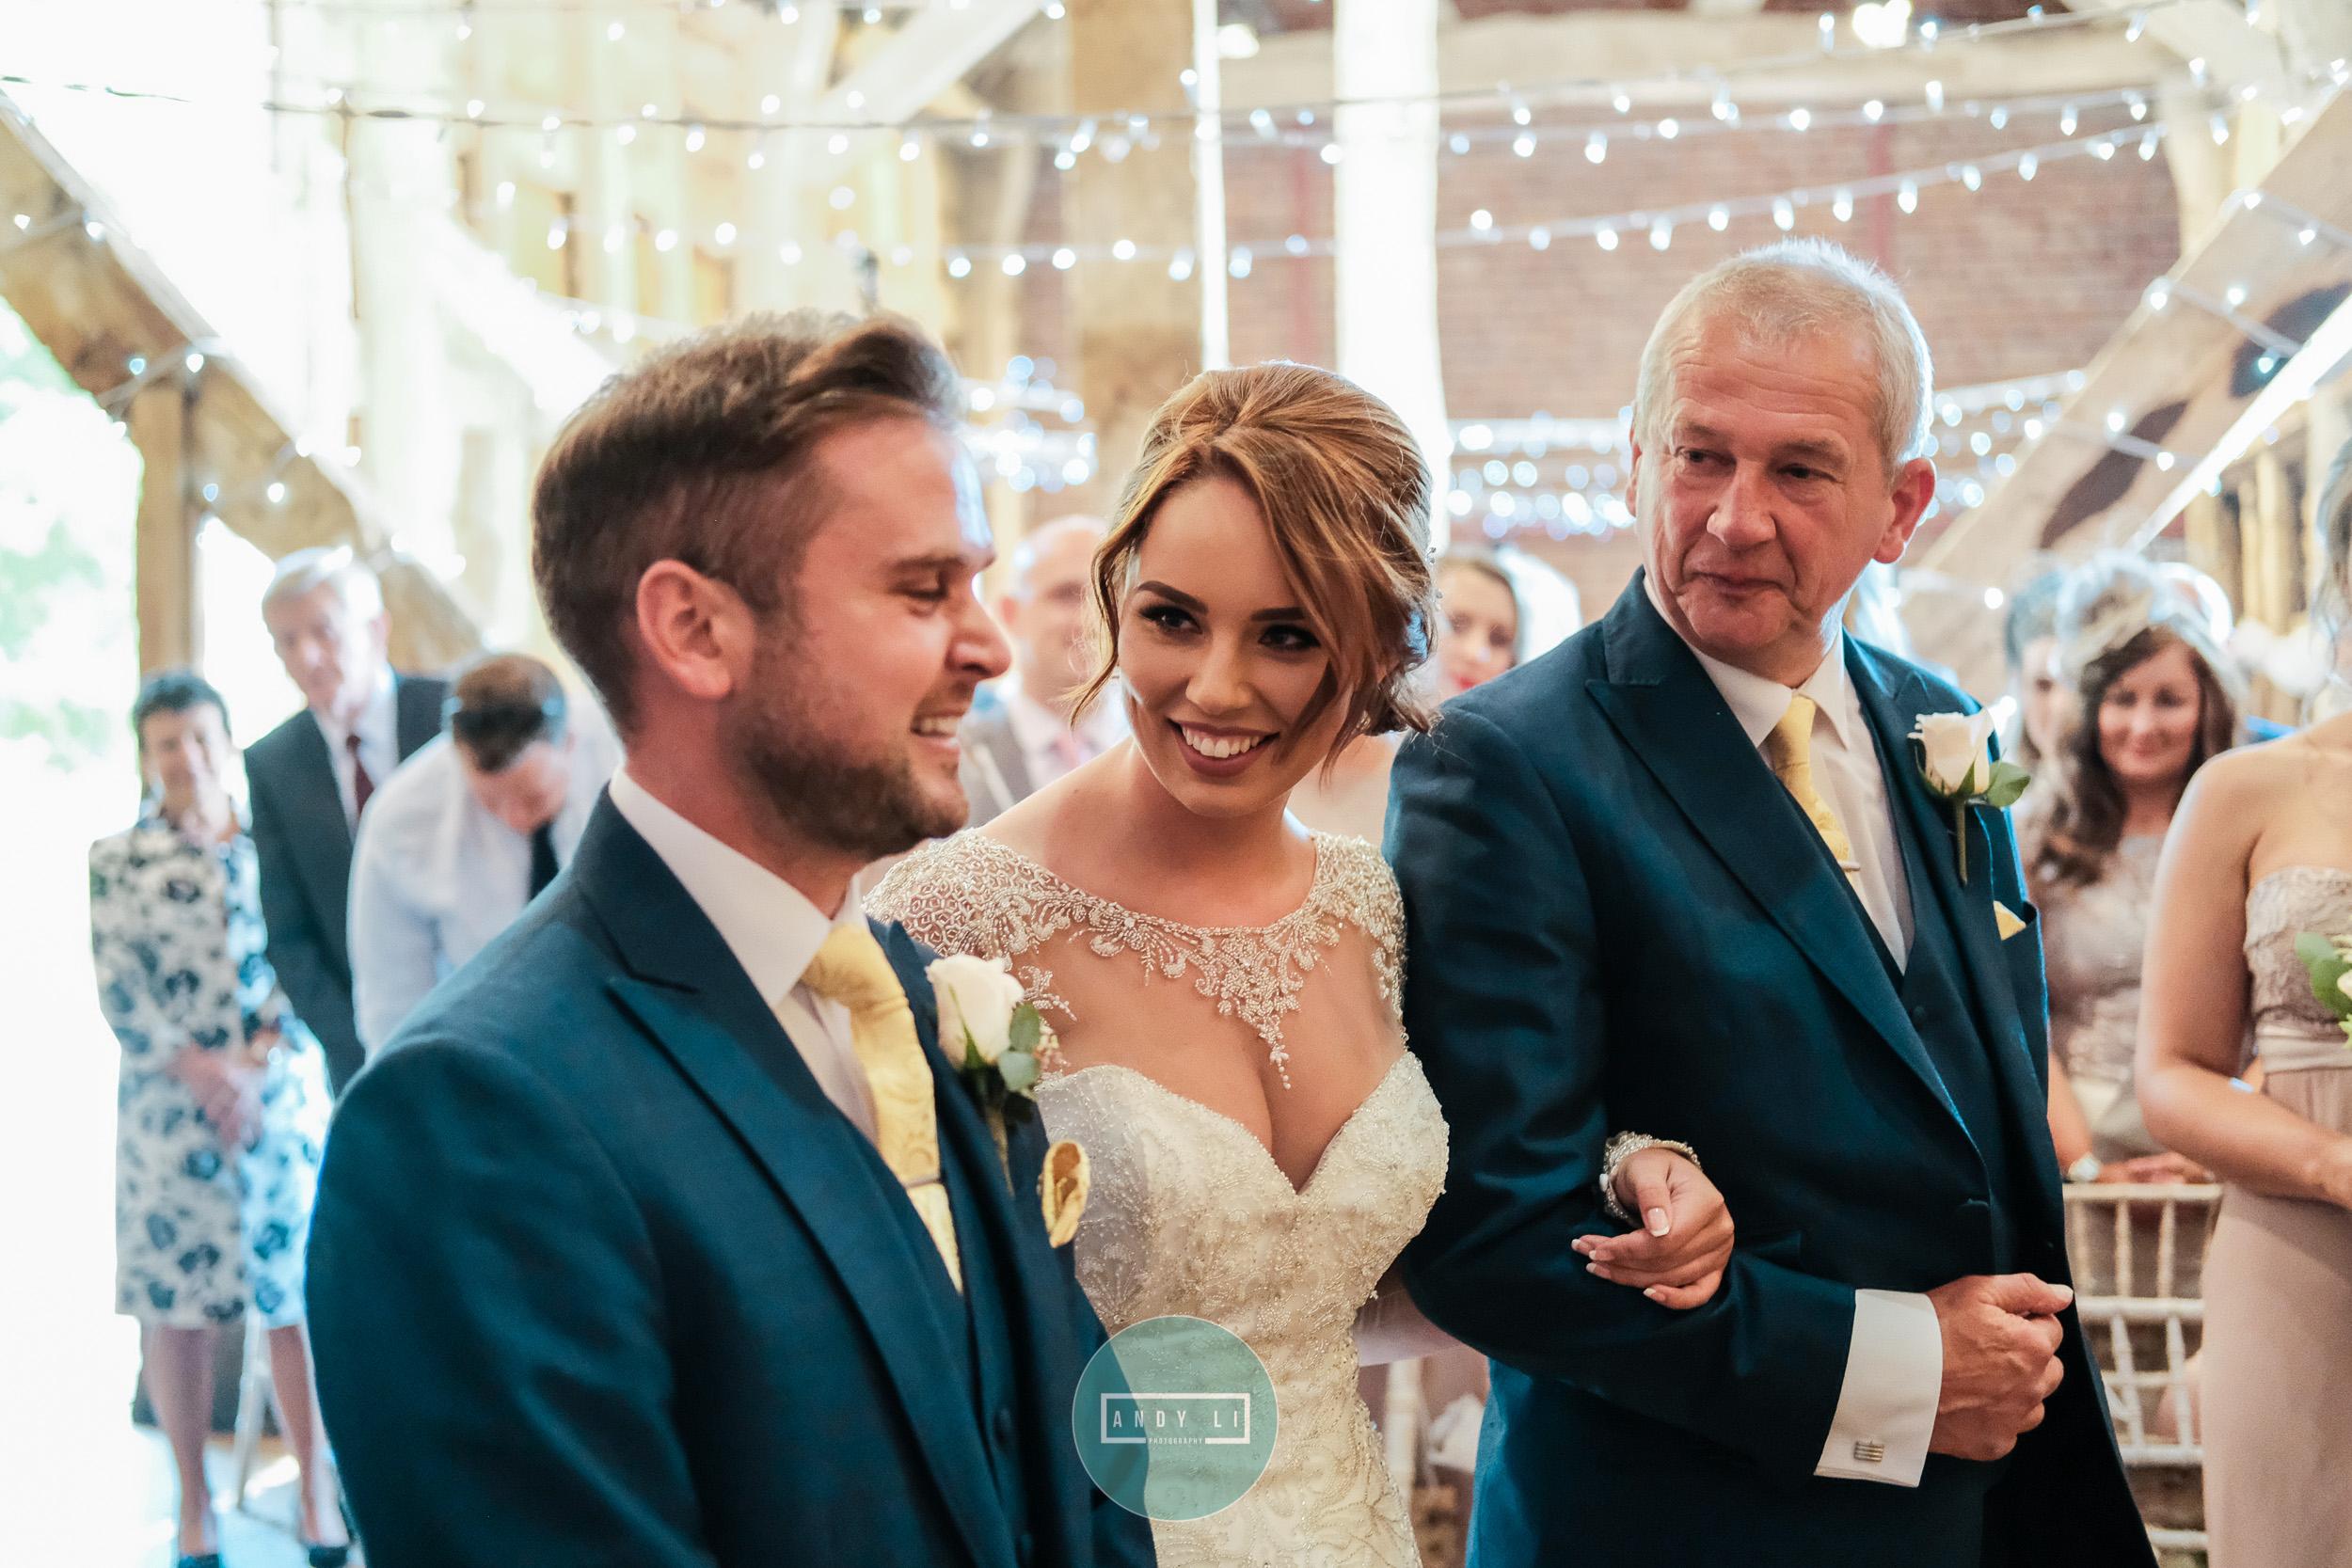 Pimhill Barn Wedding Photographer-060-DSCF0168.jpg